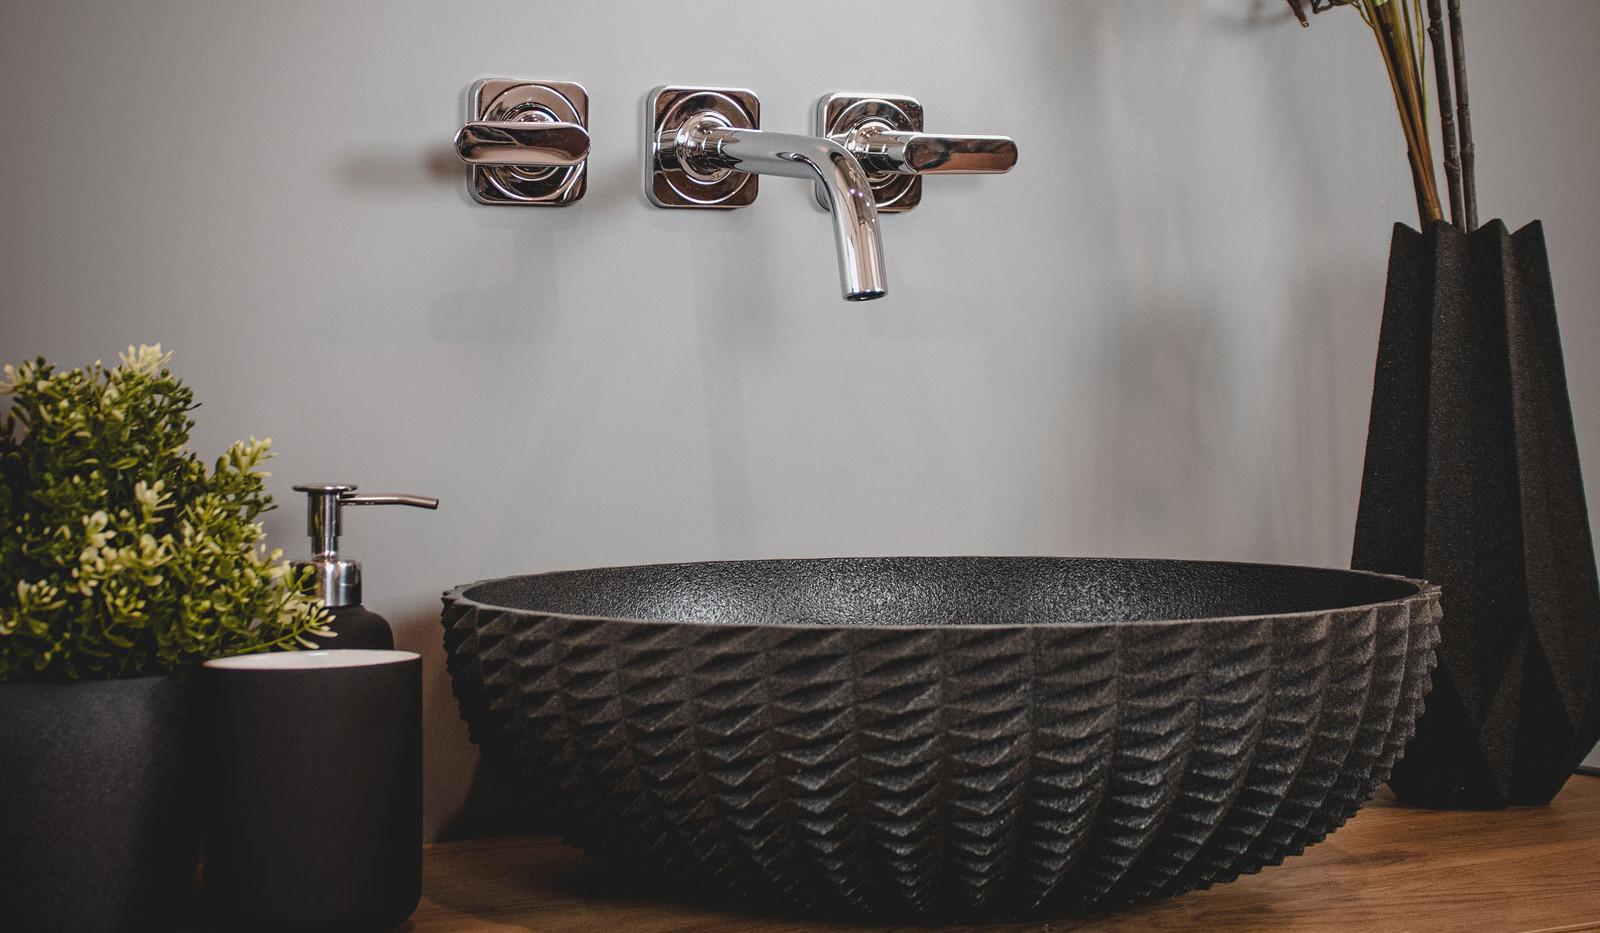 washbasin-jag-roug-stone-standard-perspe